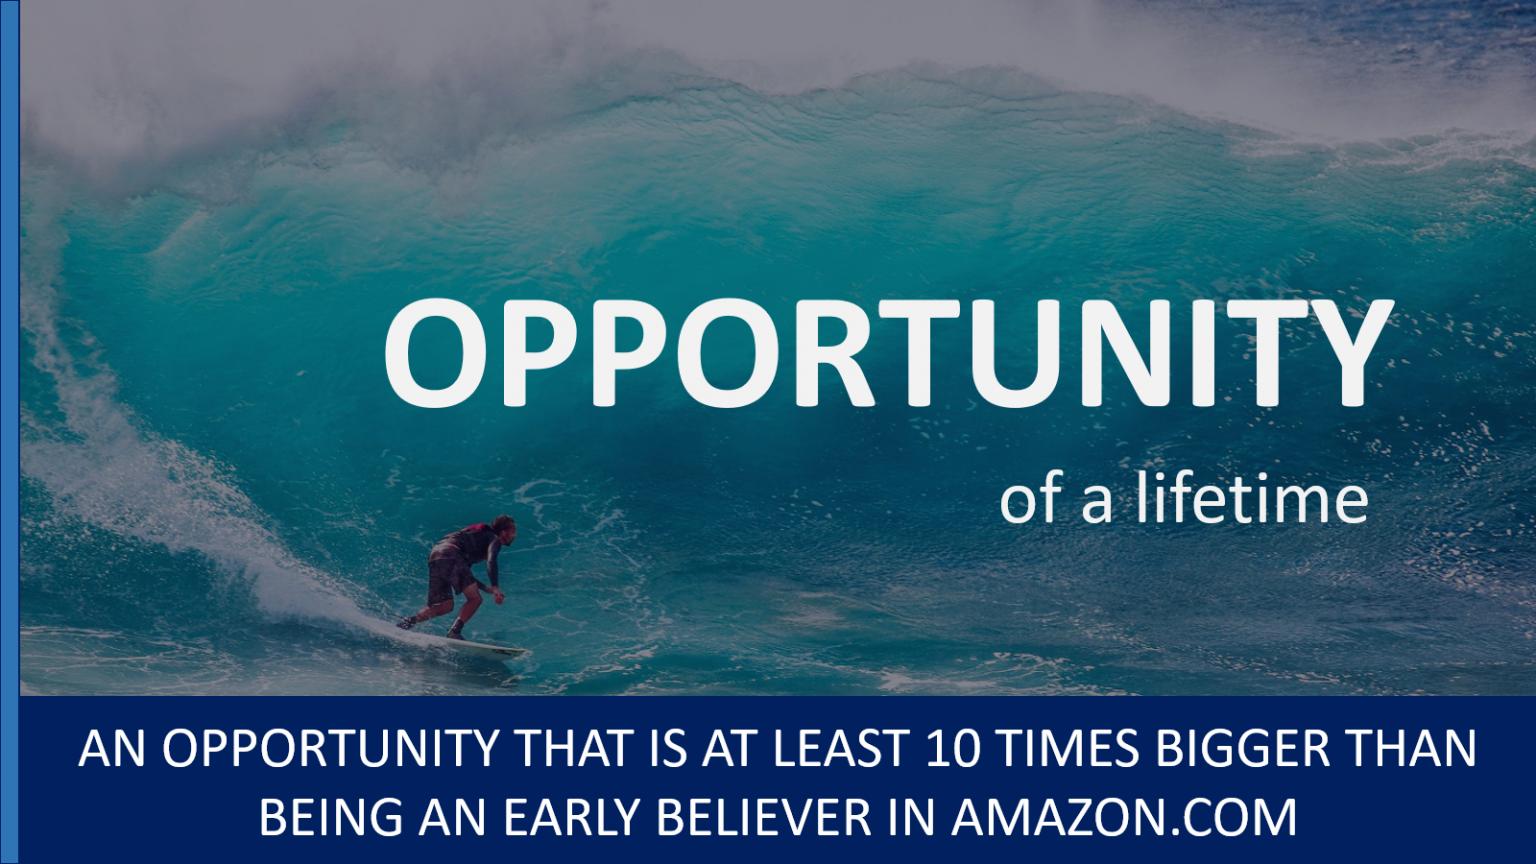 33 - Ten10 - Opportunity of a Lifetime